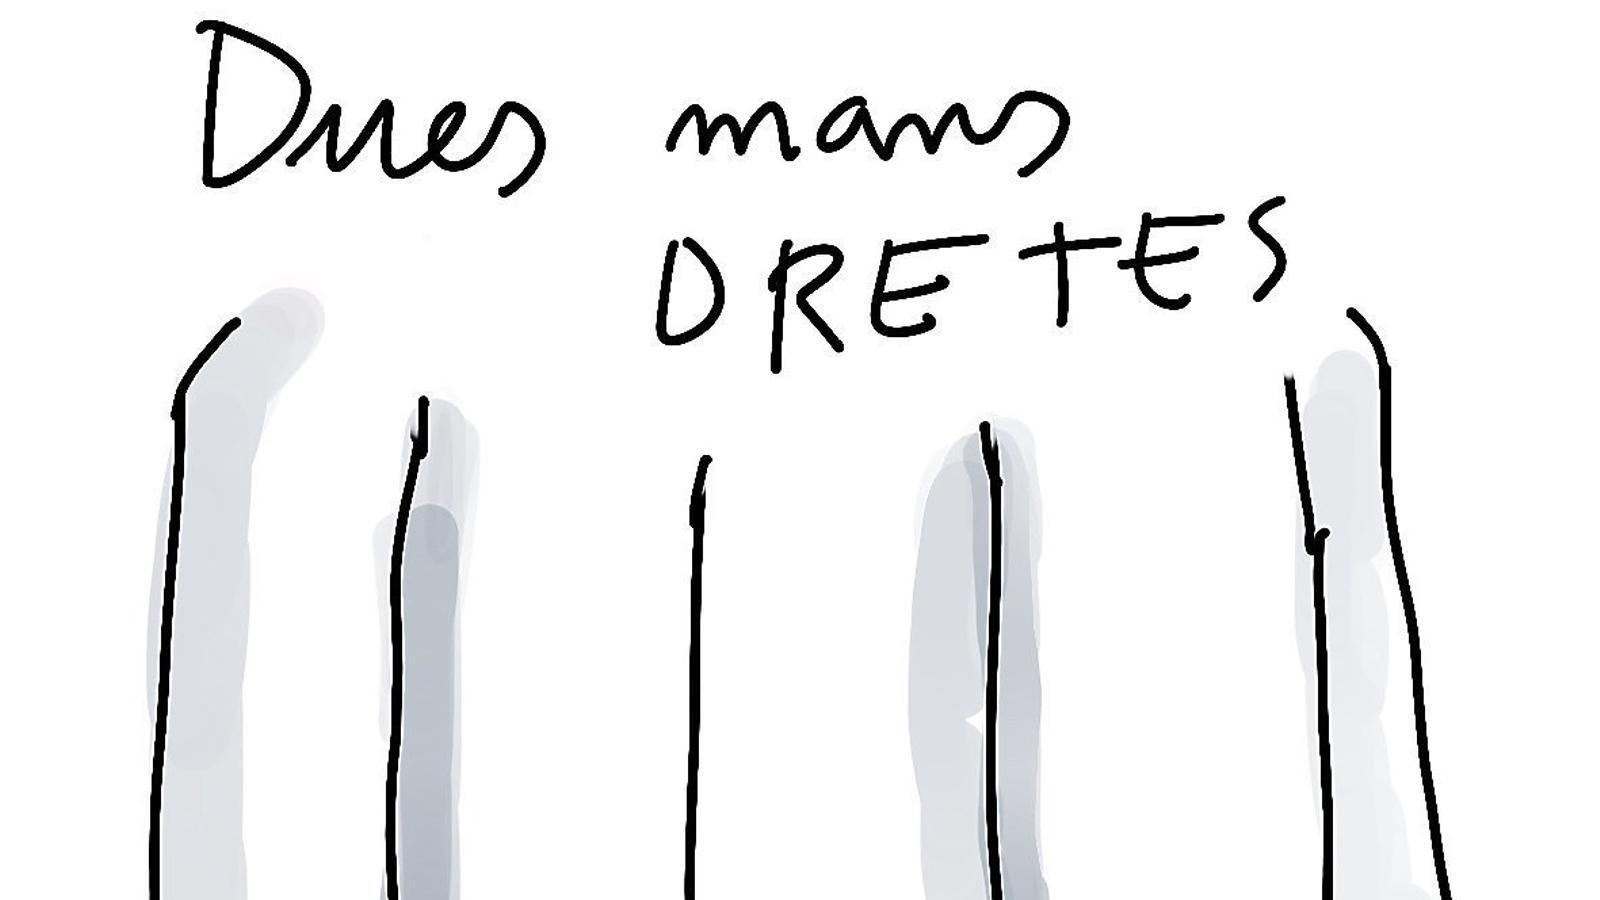 image-alt